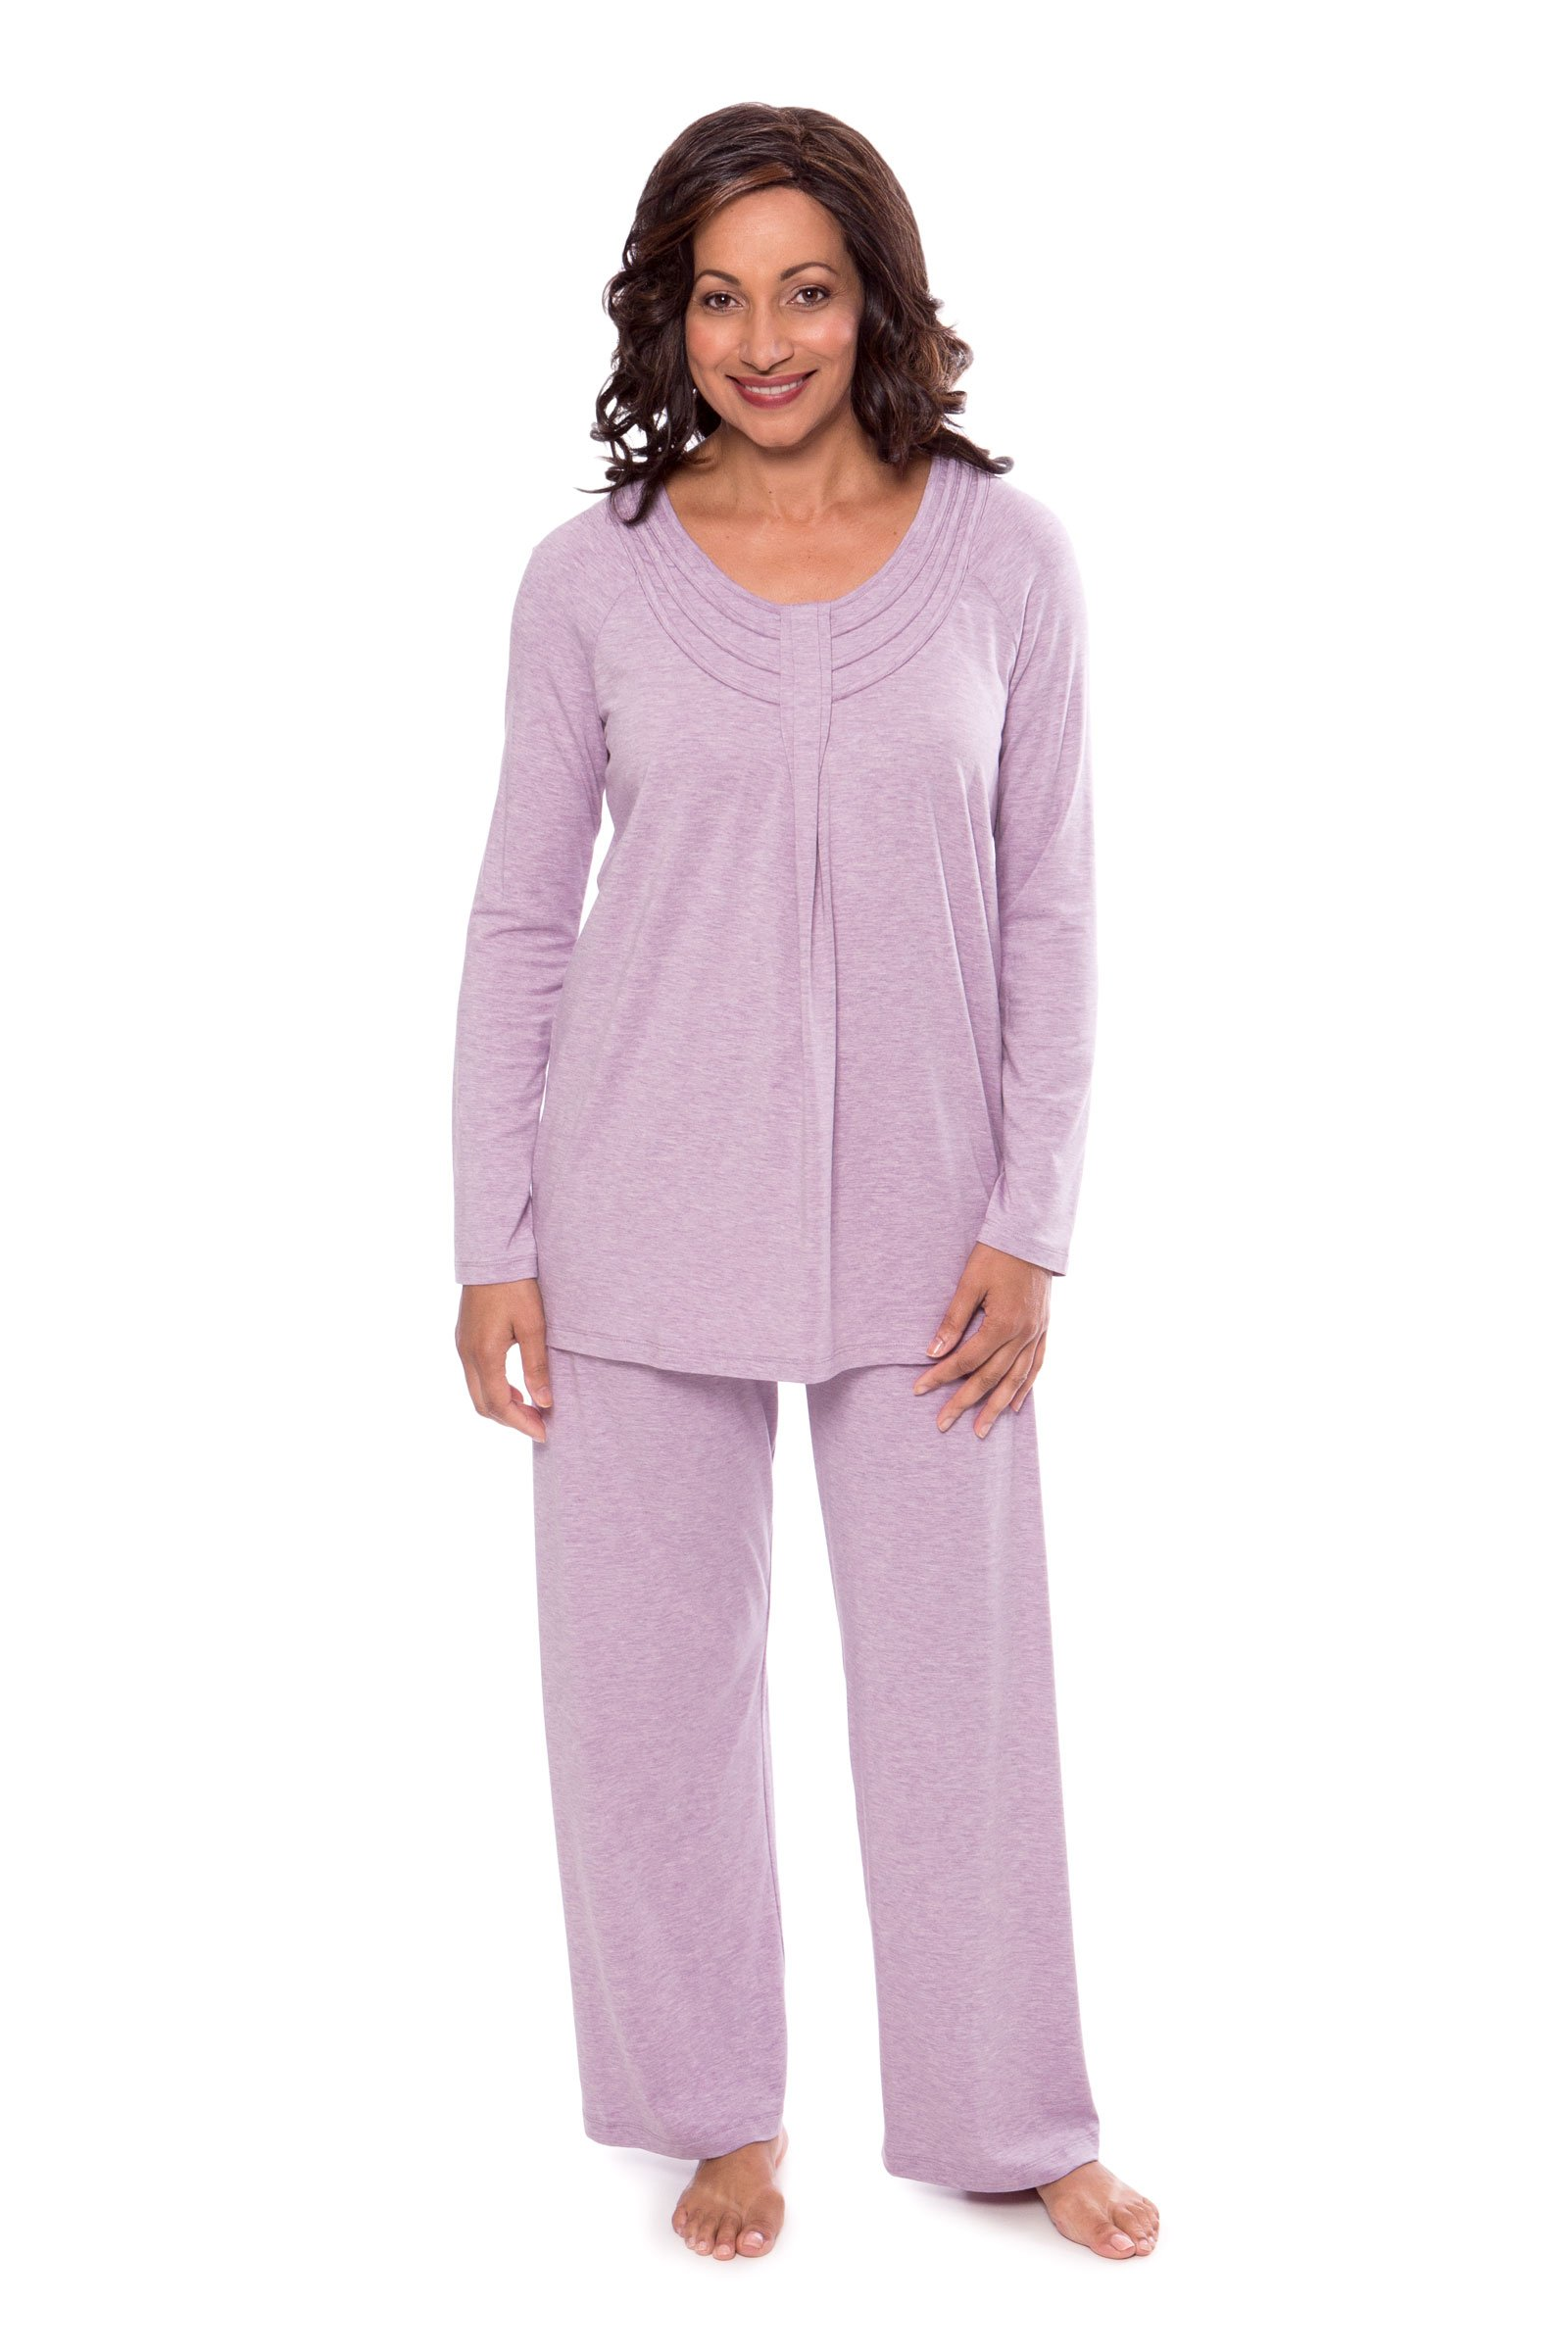 Texere Women's Long Sleeve Pajama Set (Heather Lilac, Medium) Comfortable Sleepwear PJ Sets for Juniors Ladies Women WB9996-2P1-M